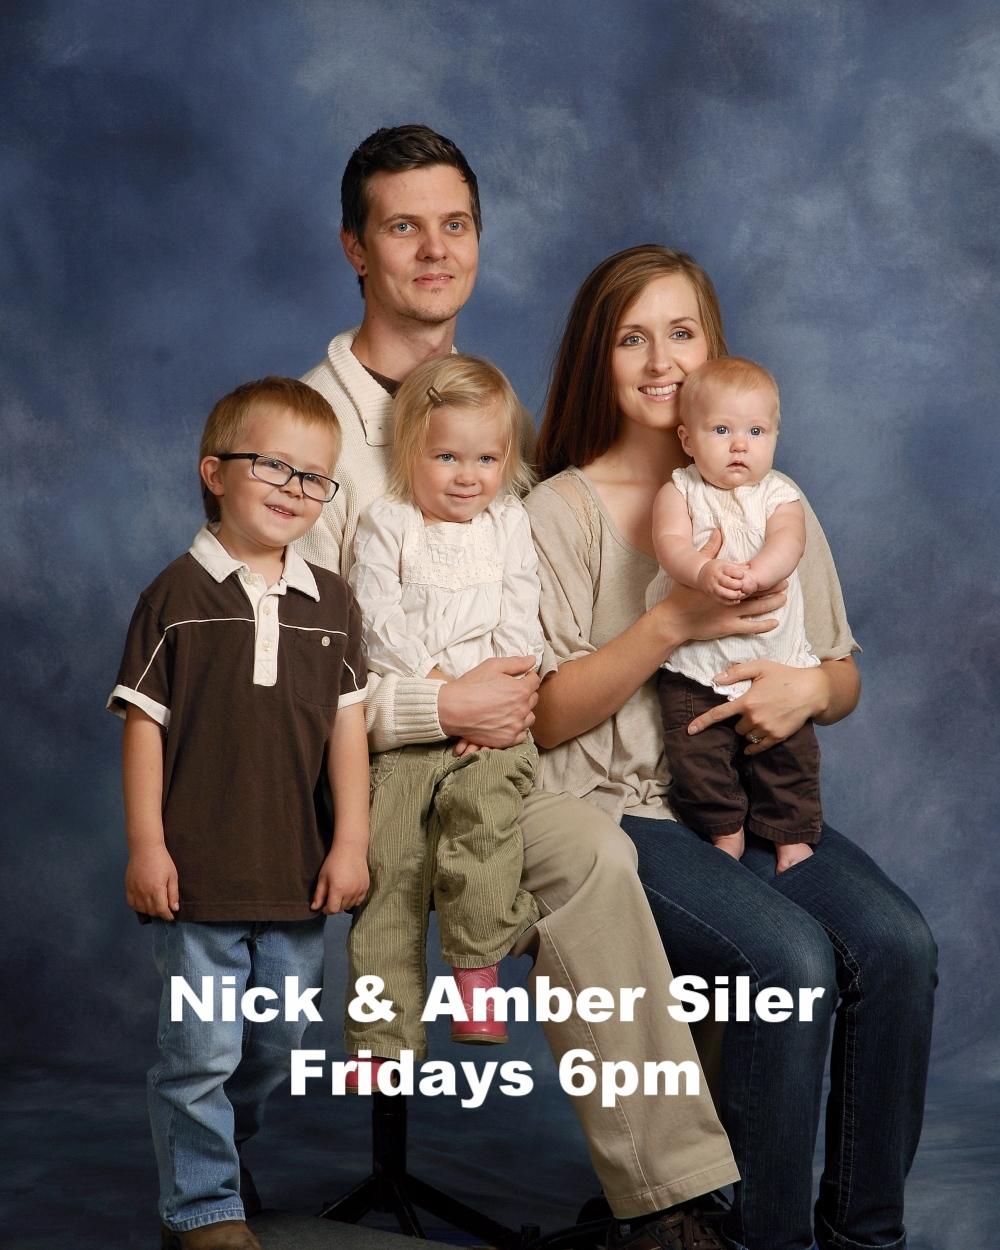 SILER, Nick & Amber; Taber, Estherlyn, Onalee.jpg